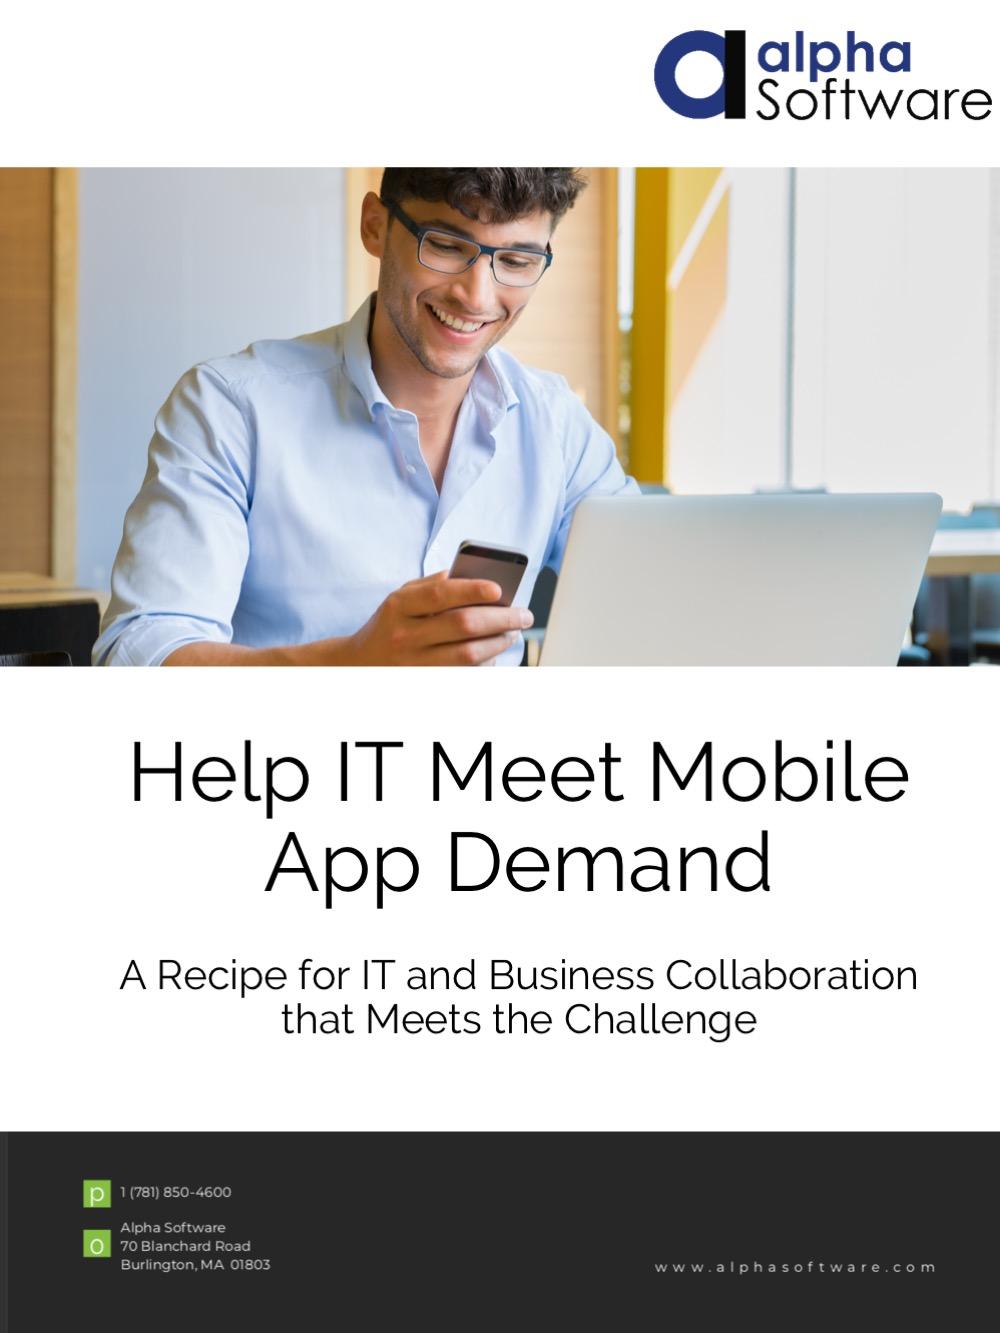 Help IT Meet Mobile App Demand WP Graphic-2